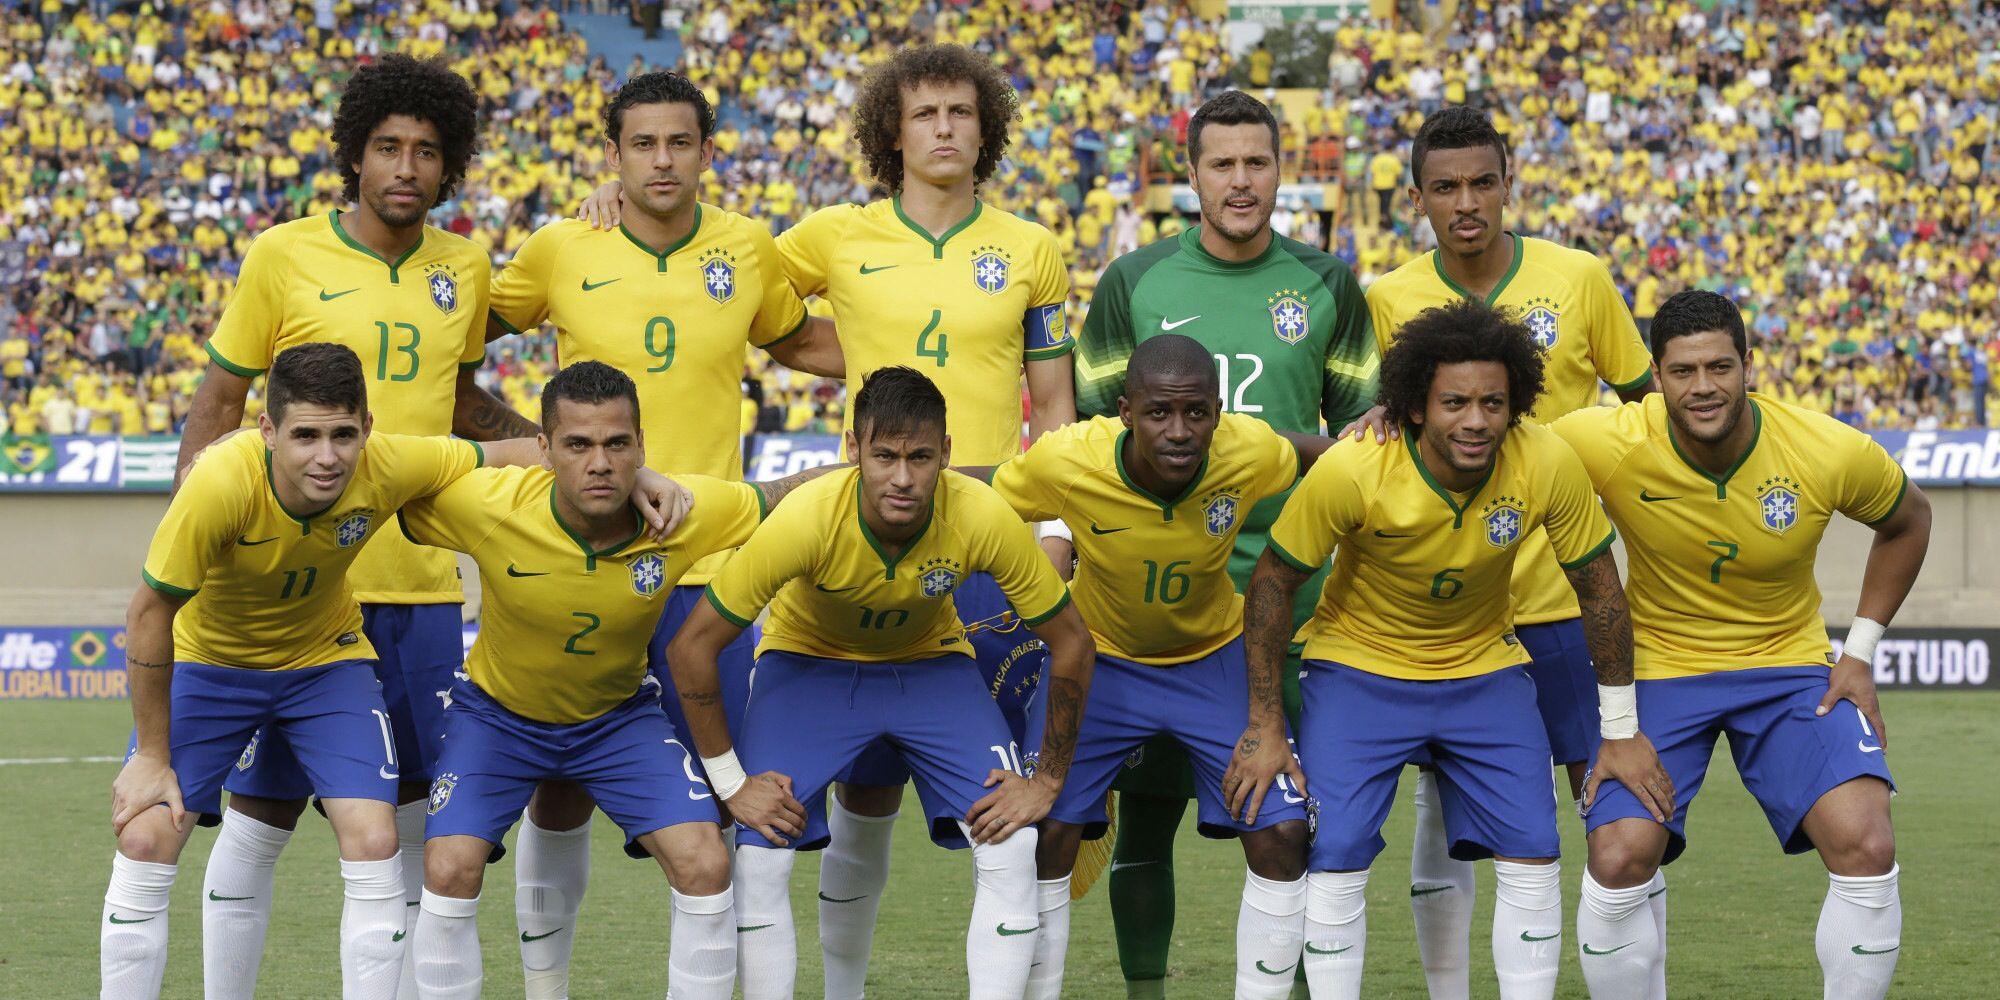 Brazil National Team Brazil Football Team Brazil Team Neymar Football